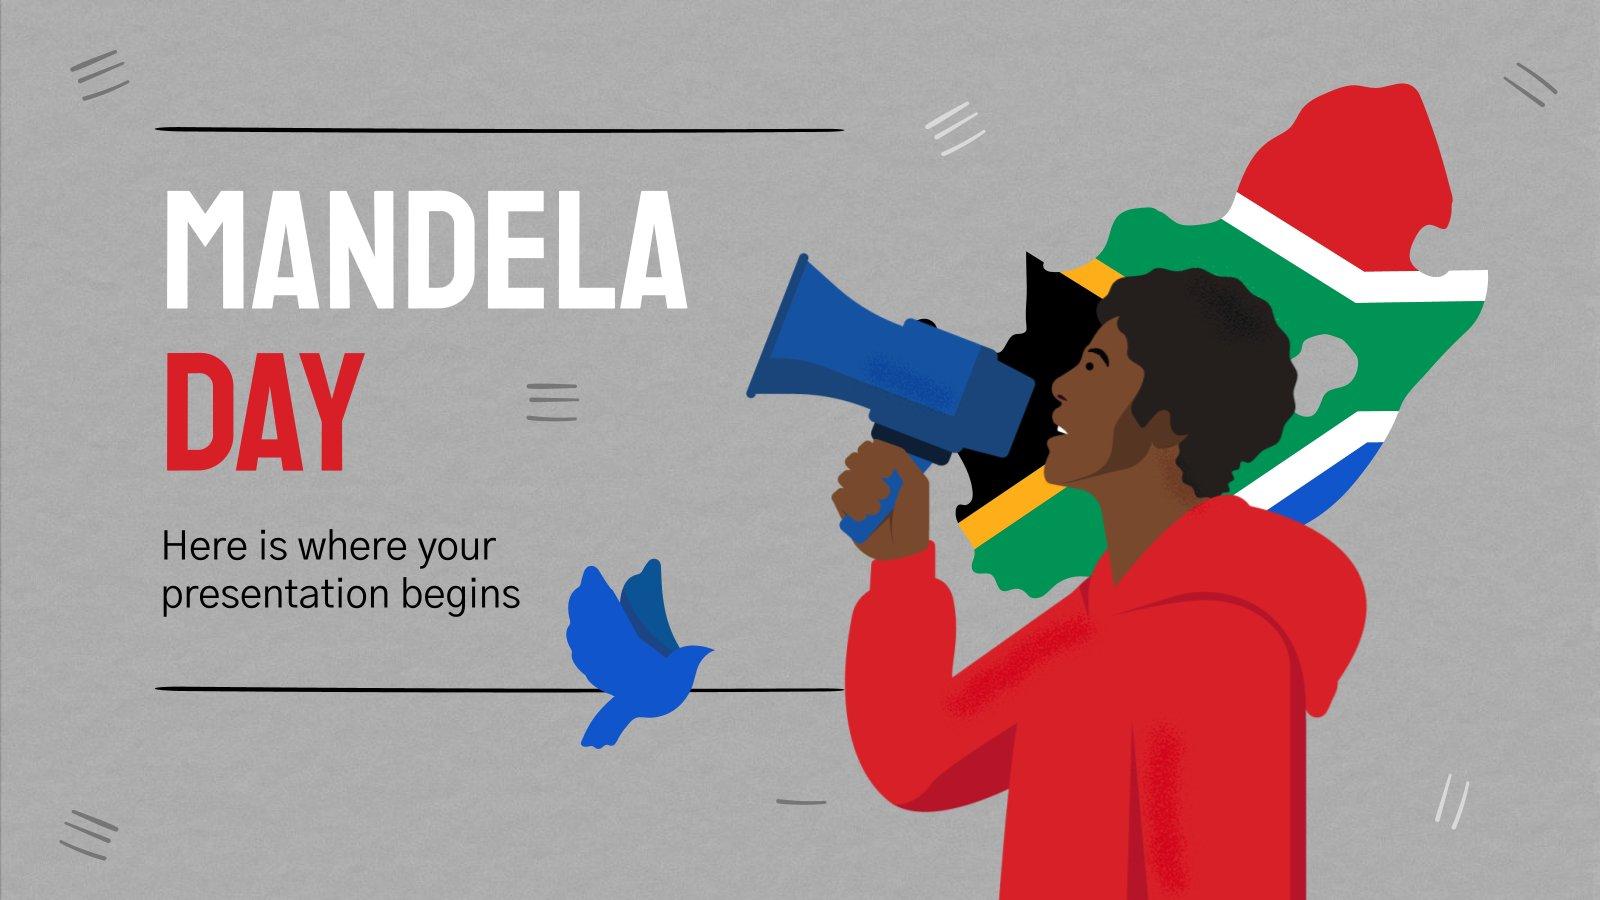 Mandela Day presentation template